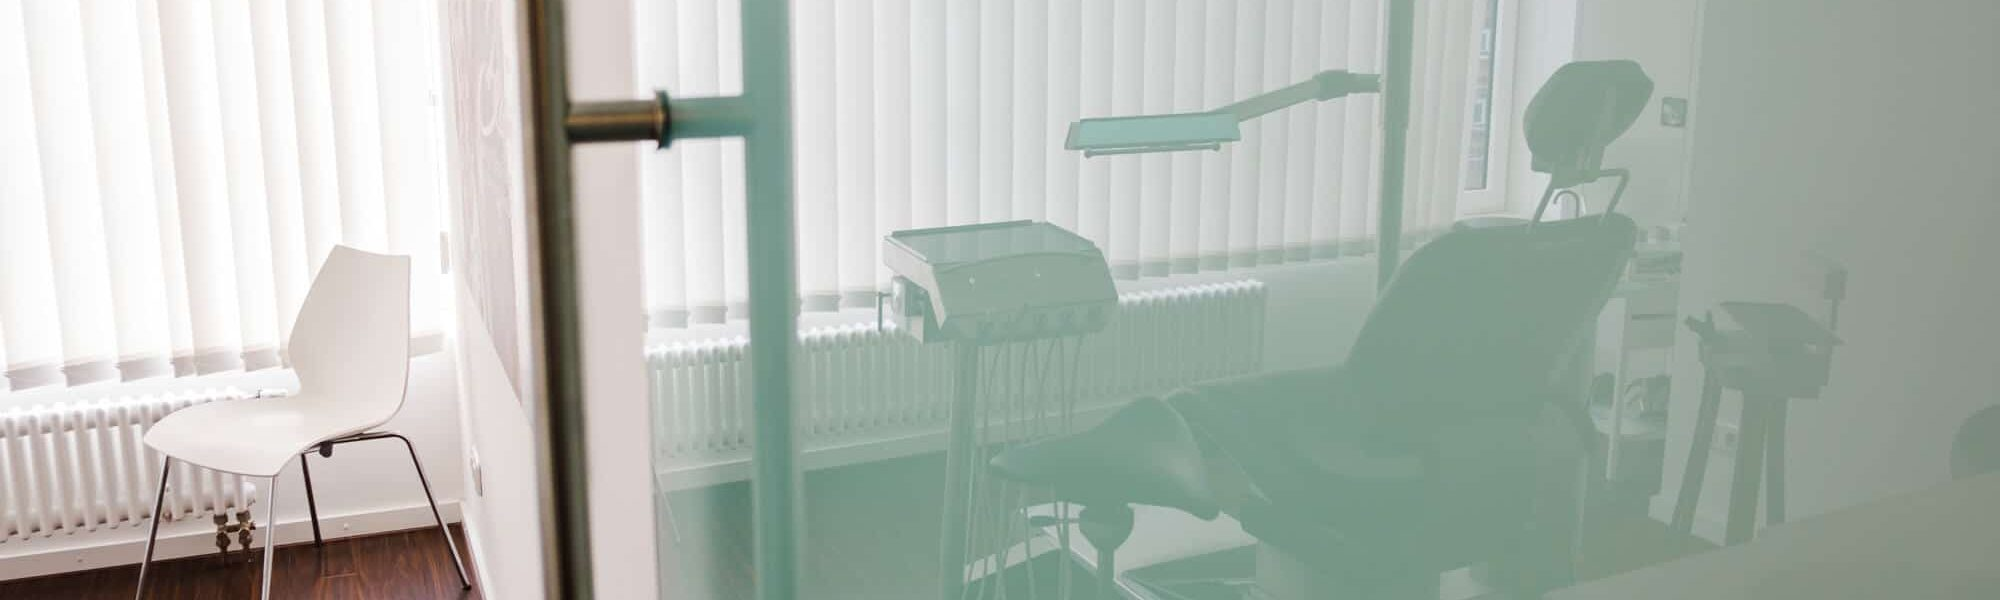 Behandlungsraum der Frankfurter Praxis   groisman & laube